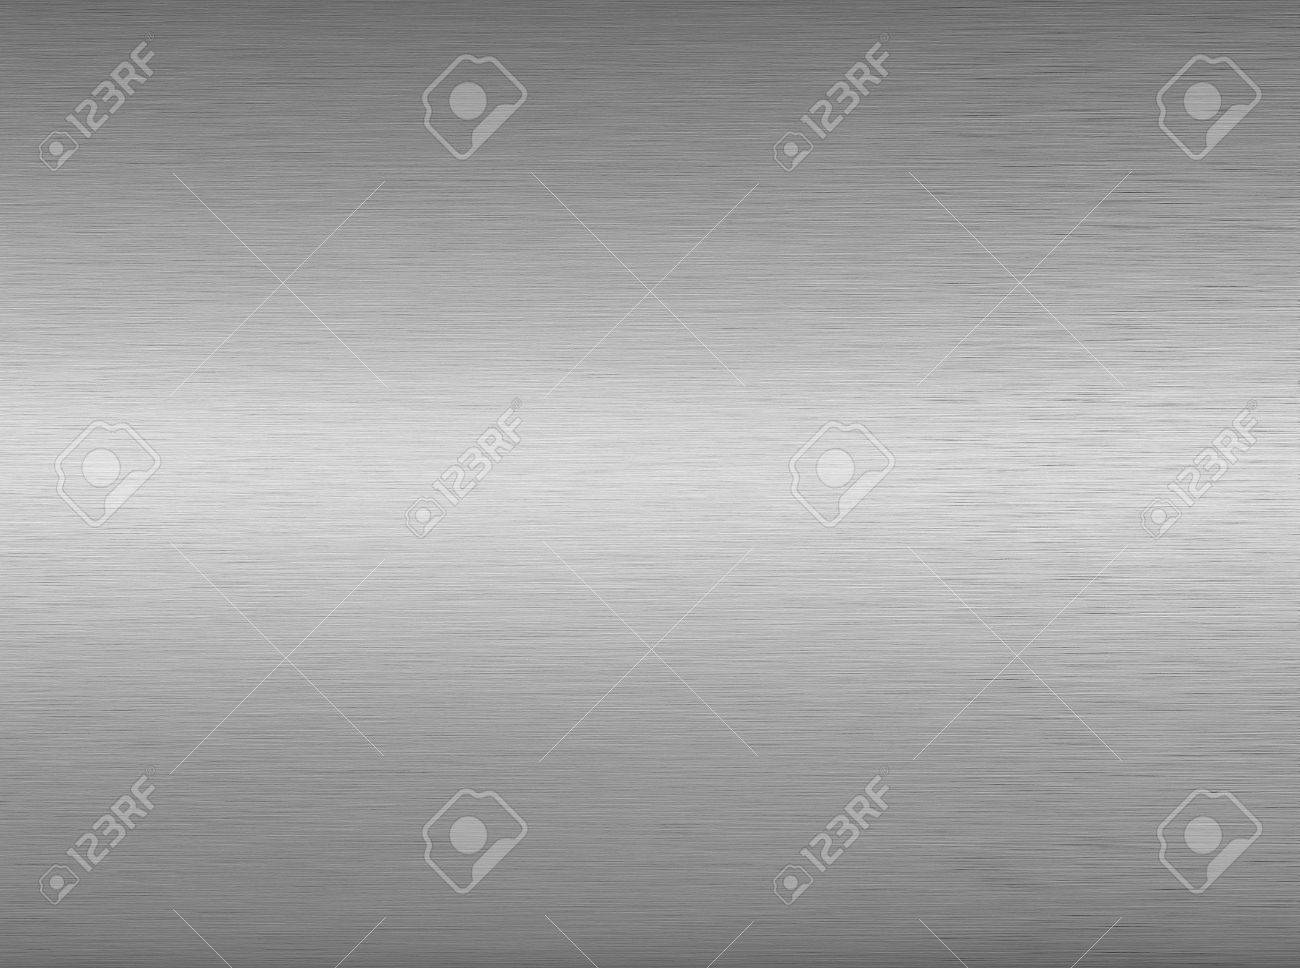 the aluminum plate Stock Photo - 6548301